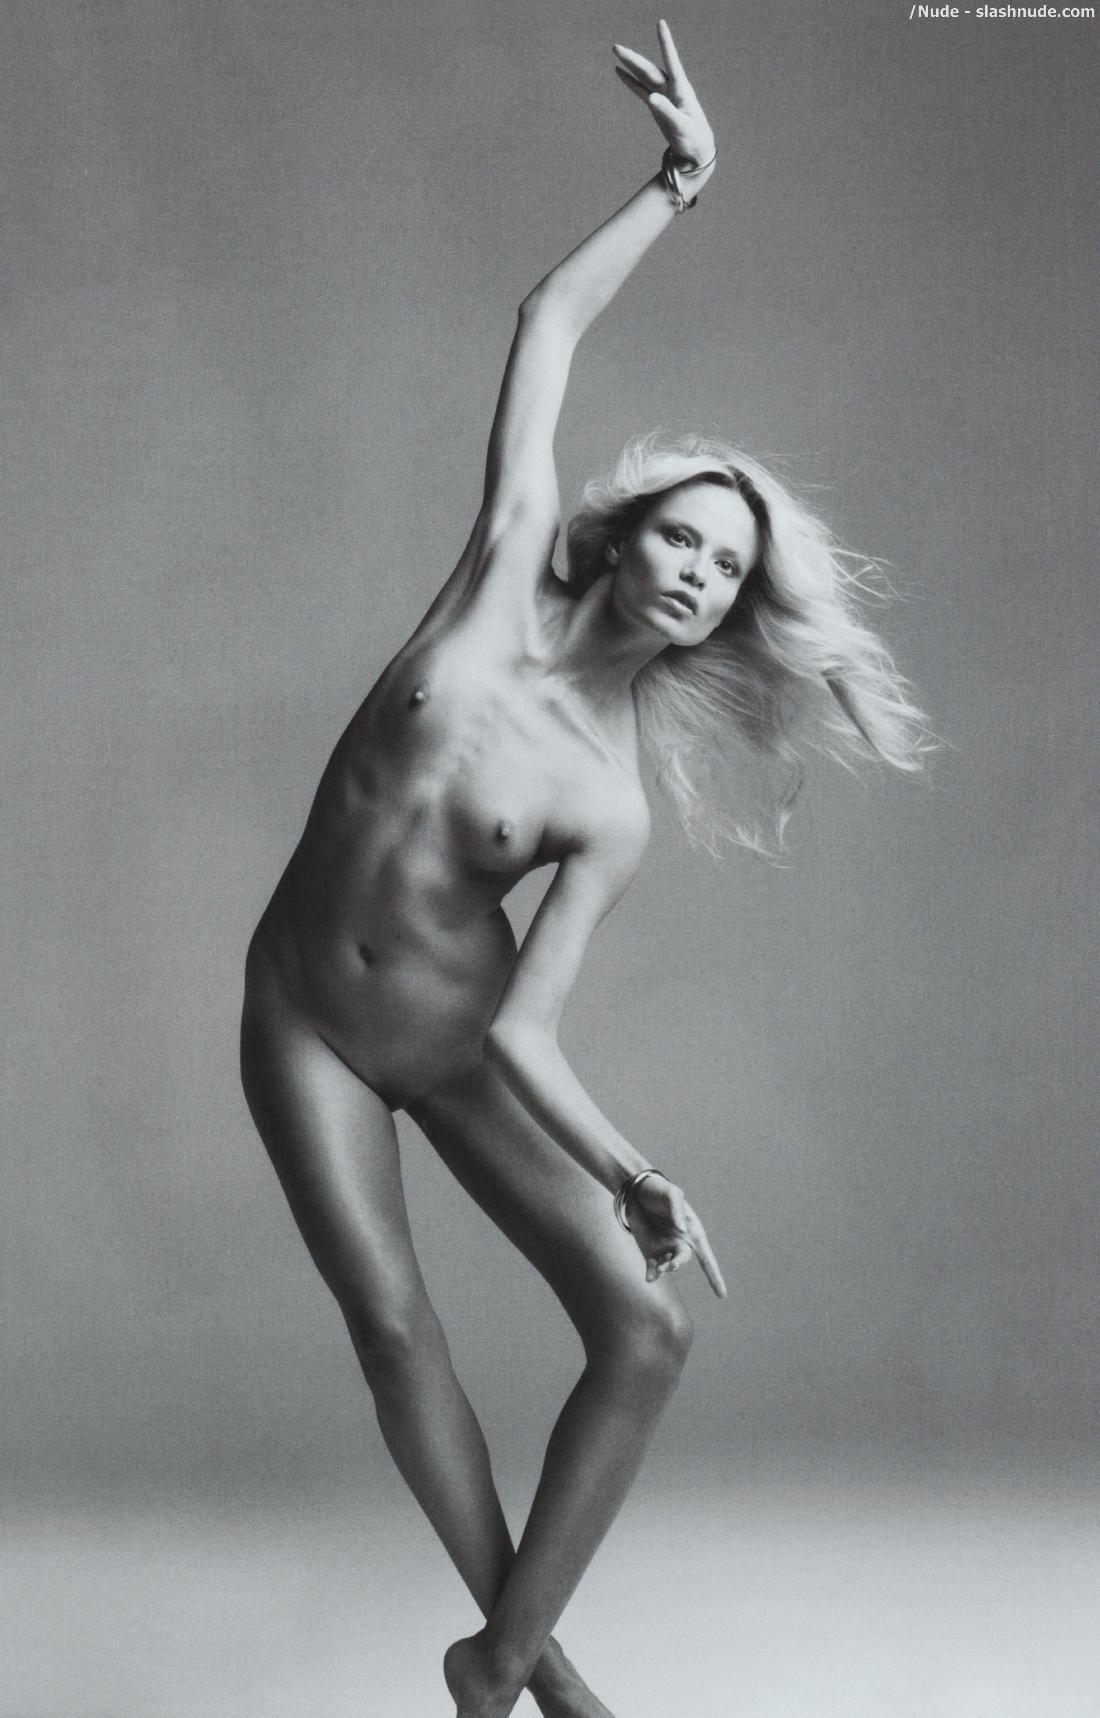 natasha poly nude ... natasha poly nude from top to bottom in vogue 1022 3 ...